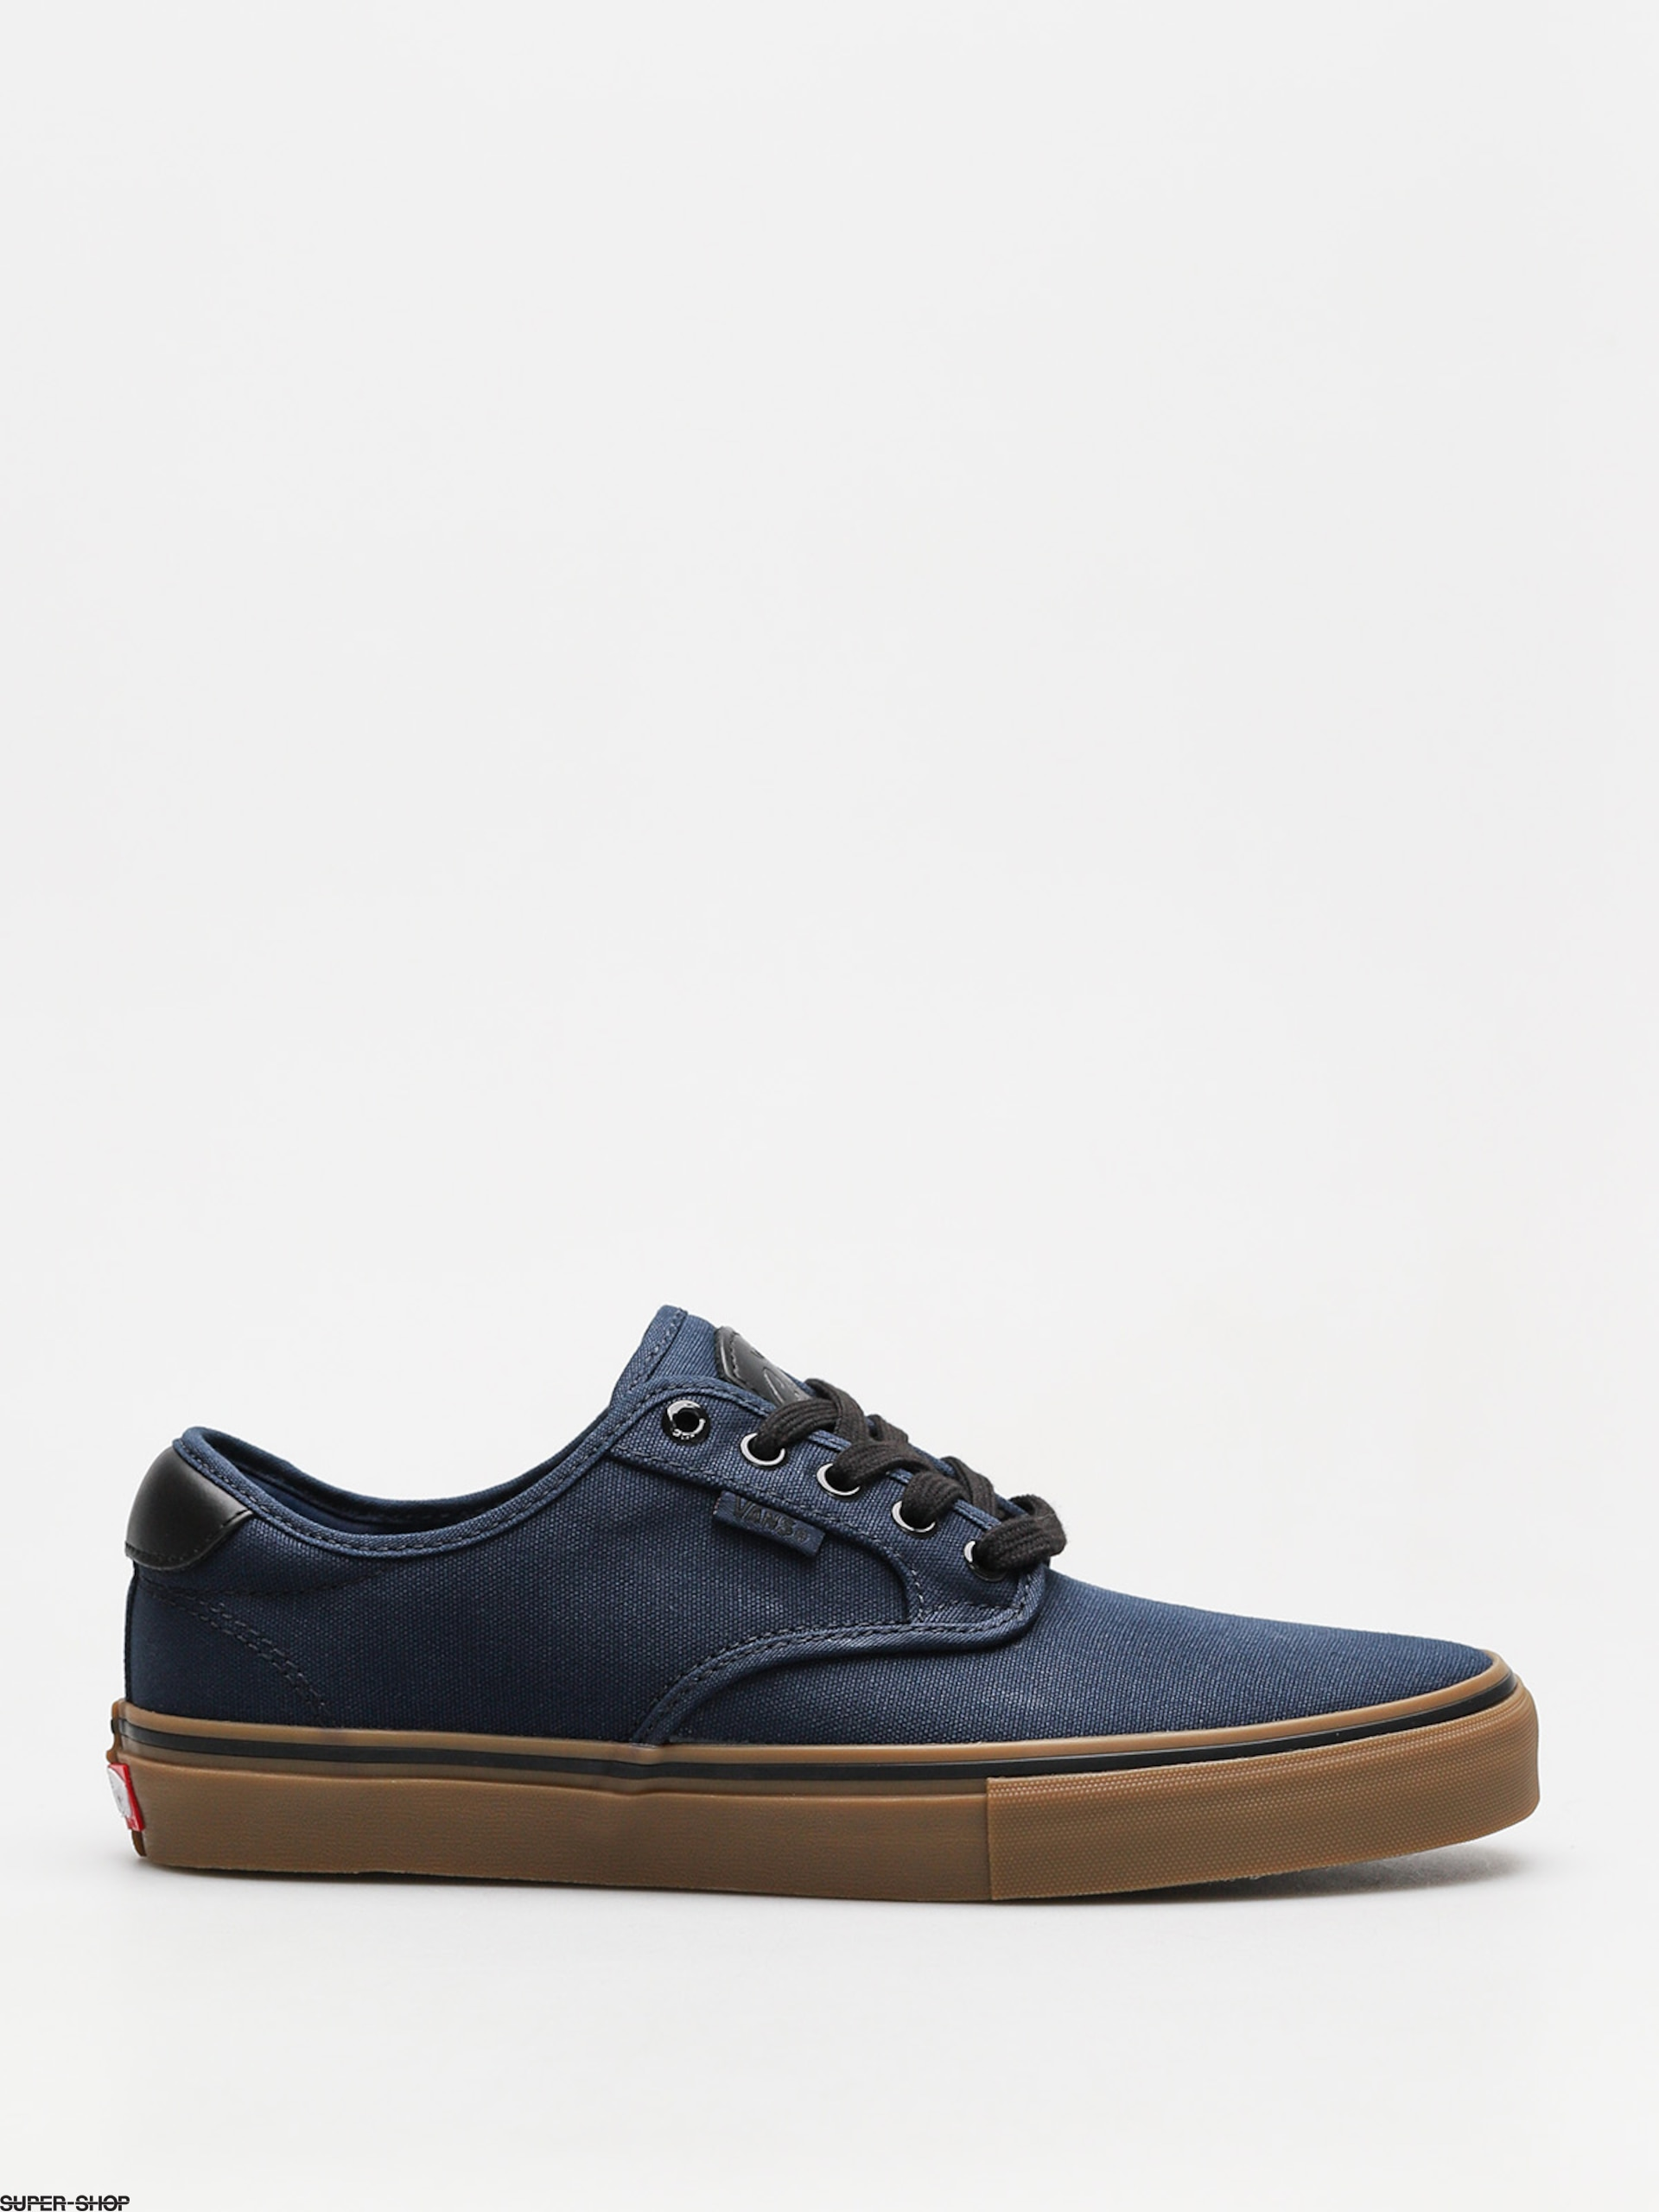 b7f953255a37d8 Vans Shoes Chima Ferguson Pro (dress blues medium gum)